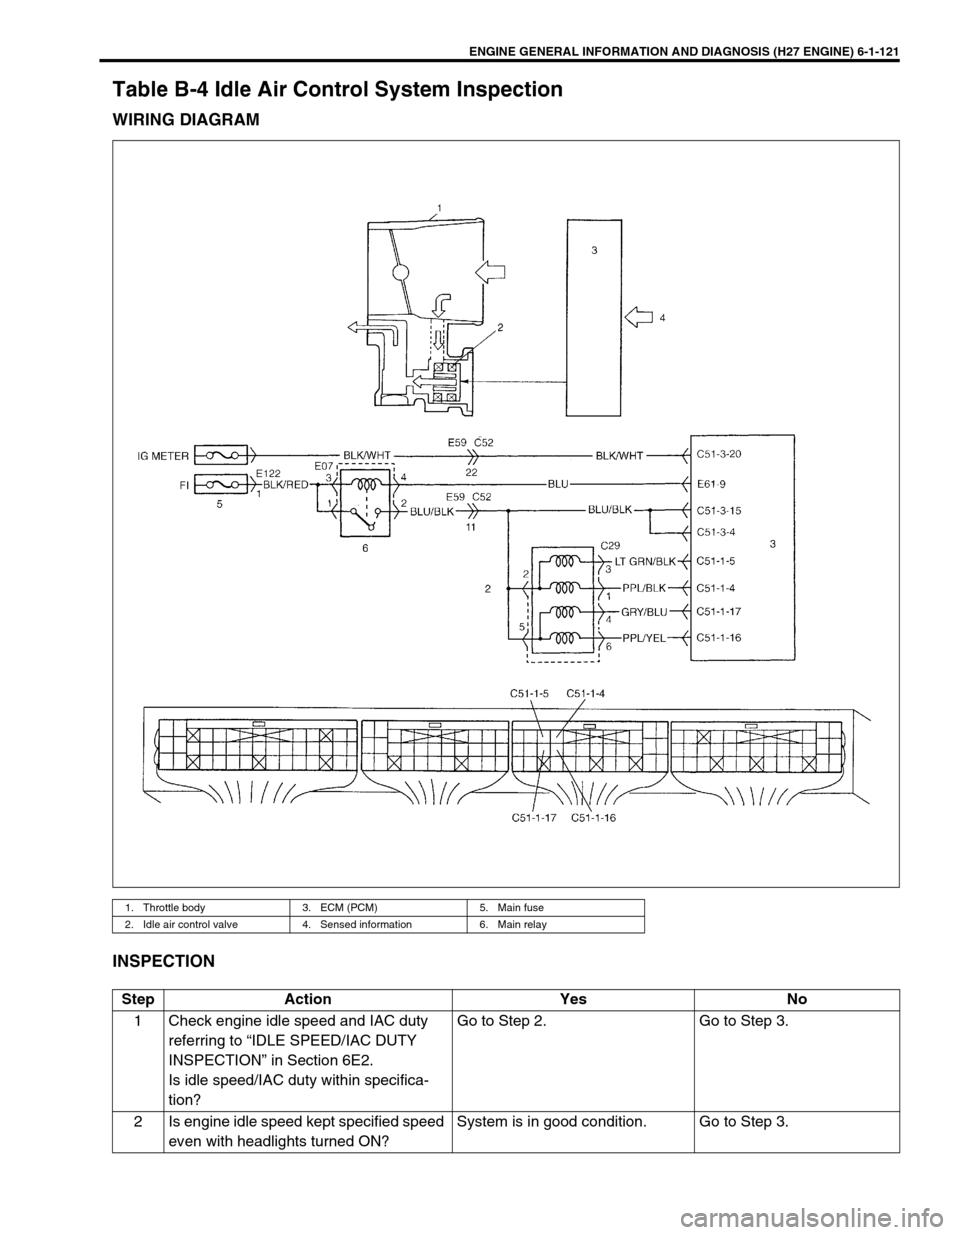 medium resolution of suzuki grand vitara 2001 2 g owners manual page 282